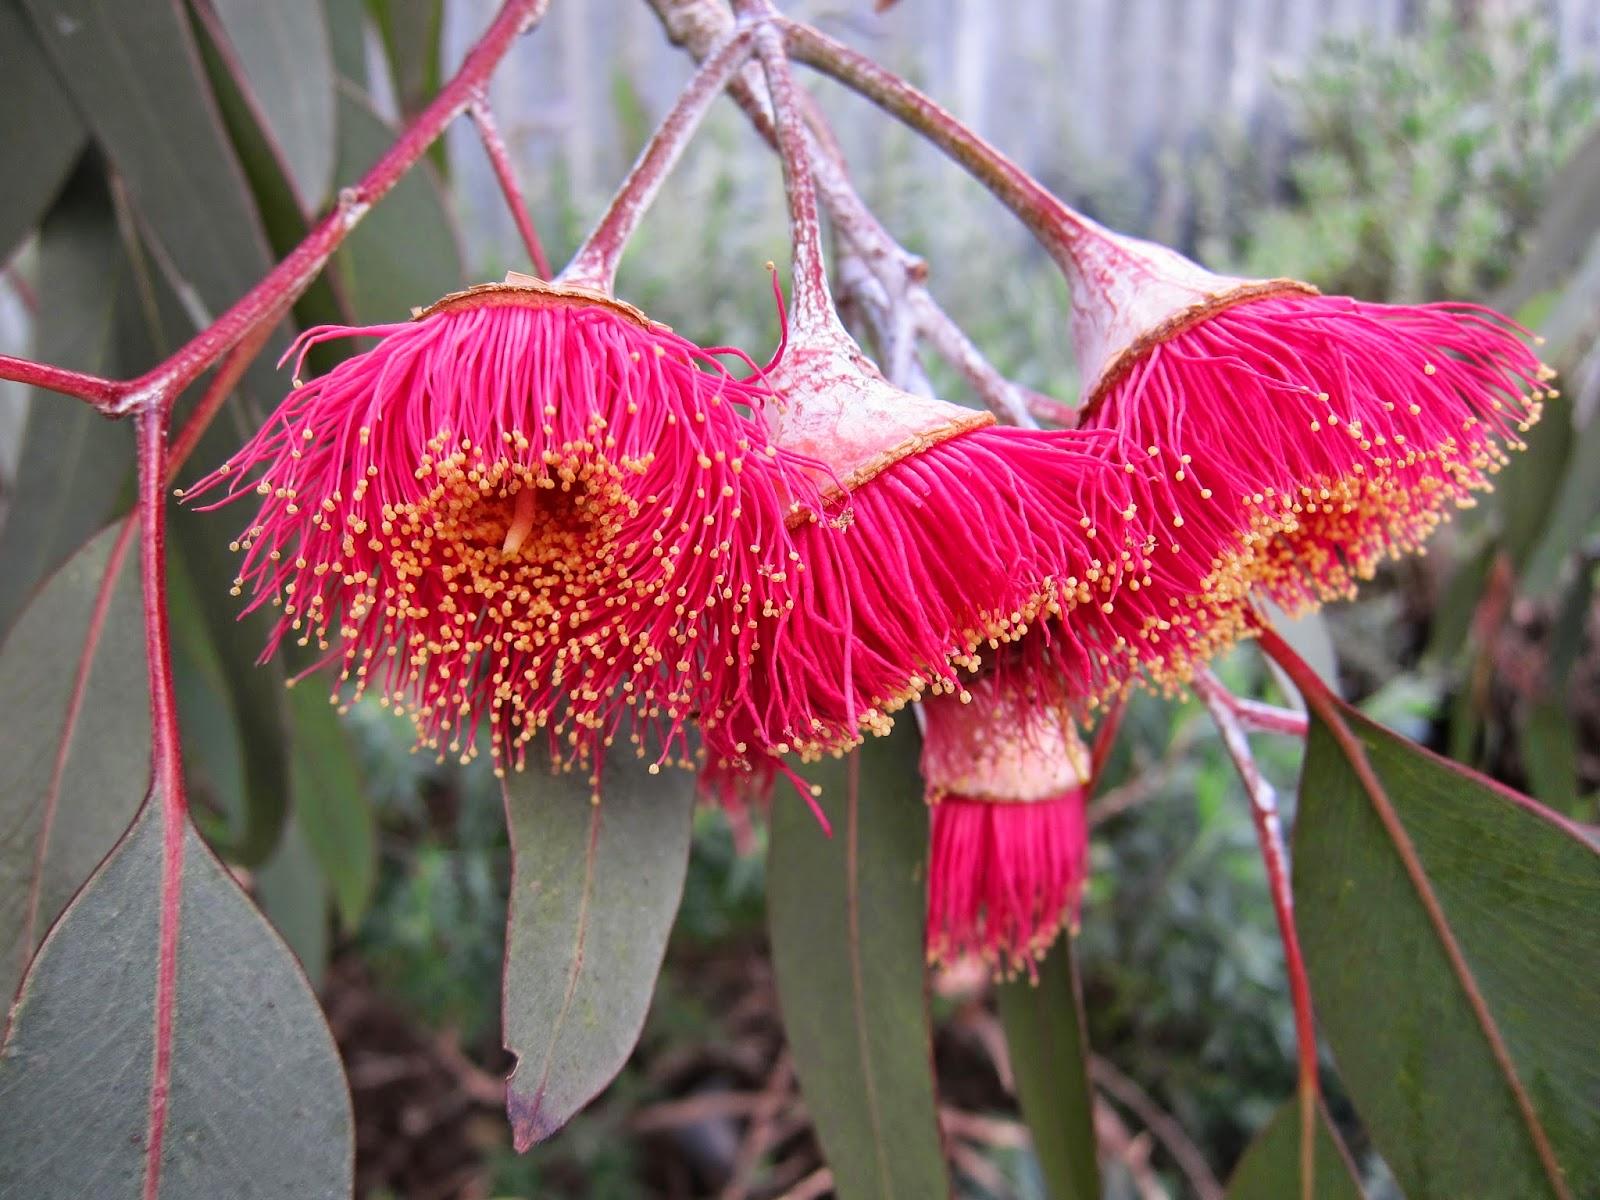 snugglepot cuddlepie flowers gumnut